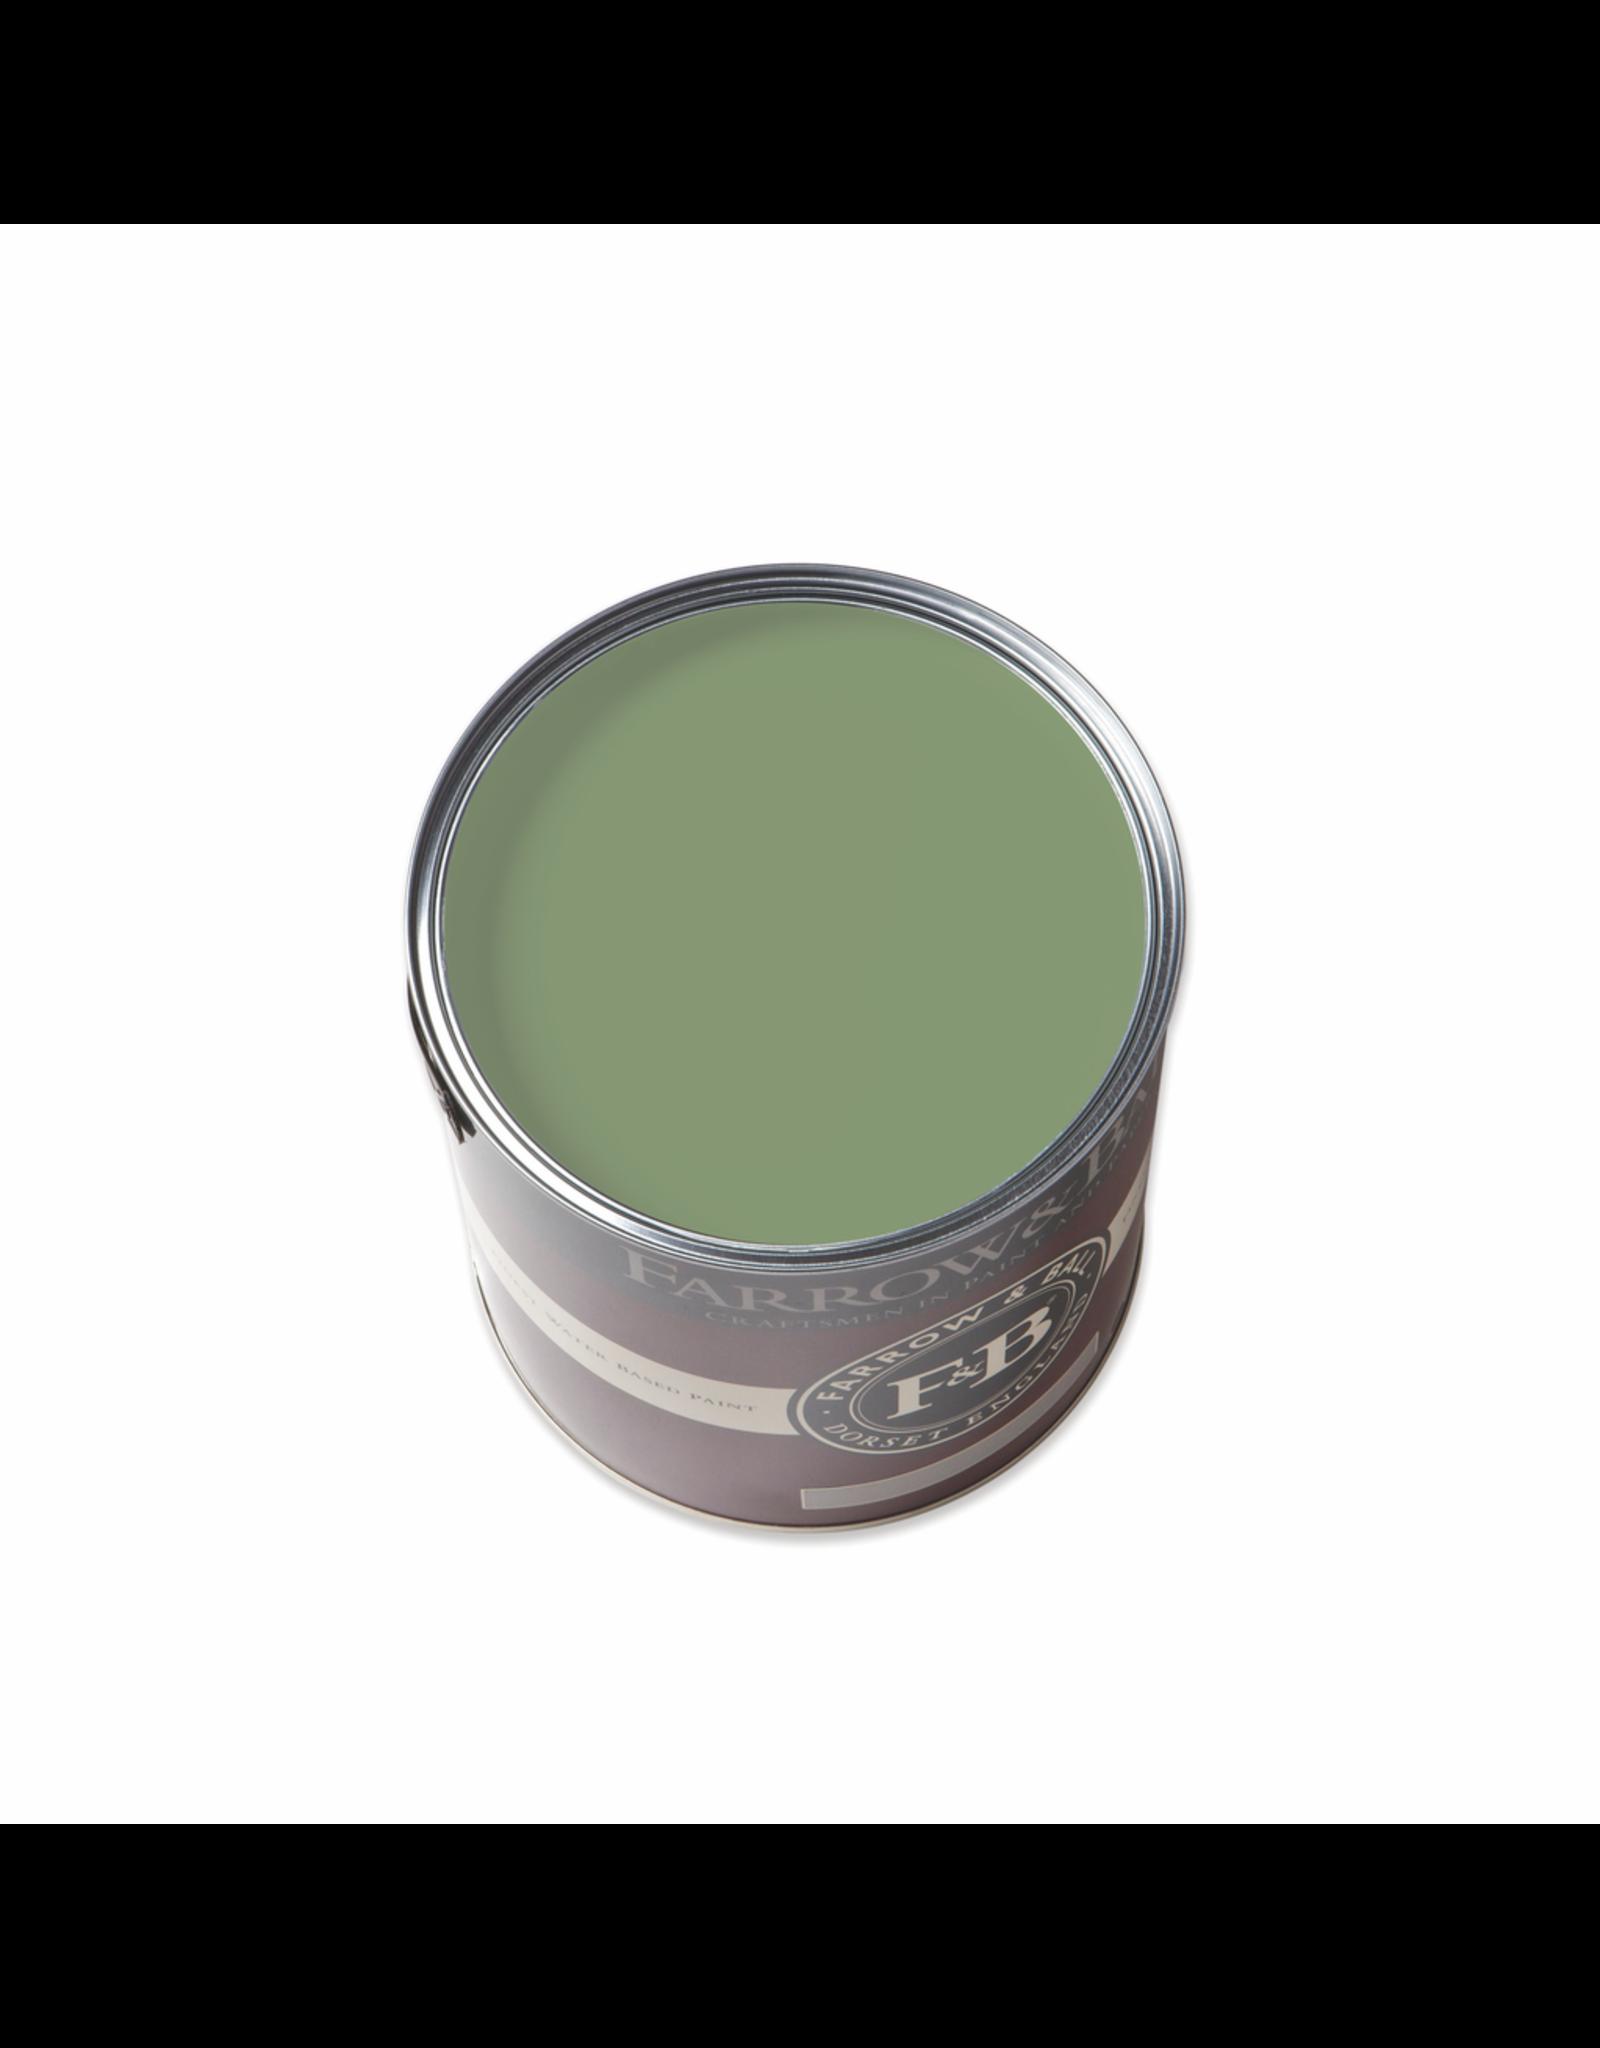 Farrow and Ball US Gallon Modern Emulsion Yeabridge Green No.287